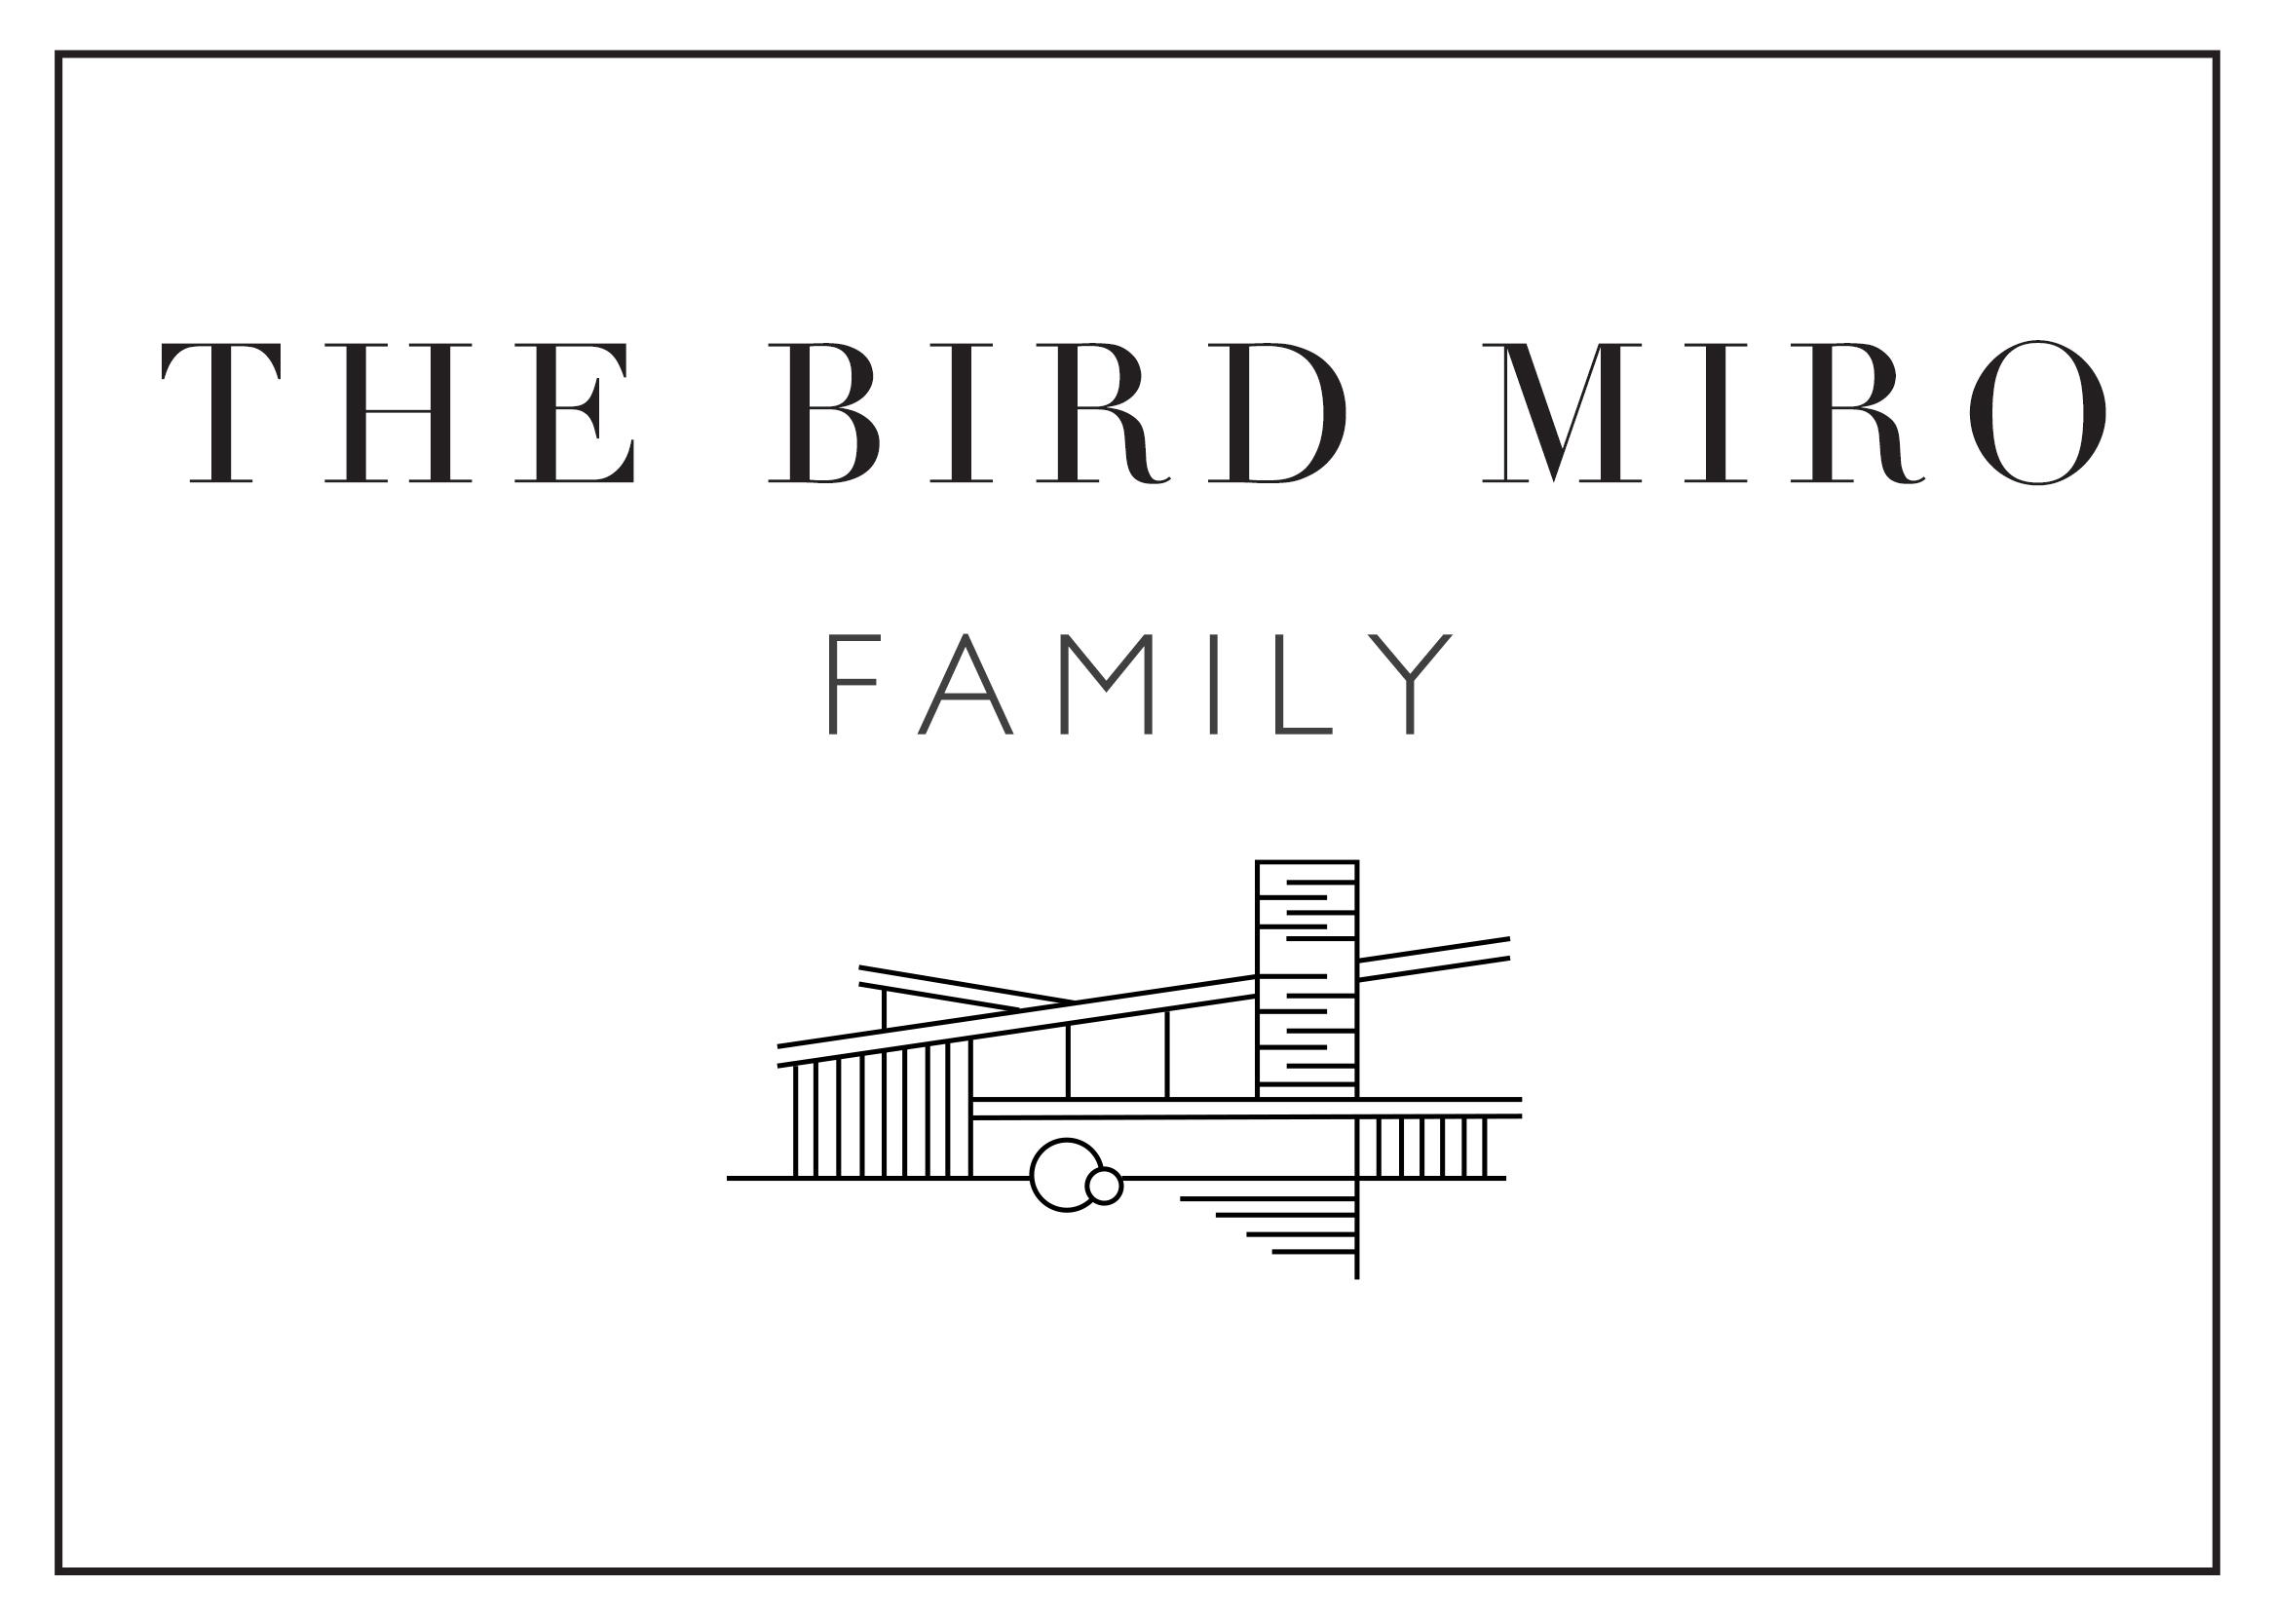 Bird Miro Family.jpg